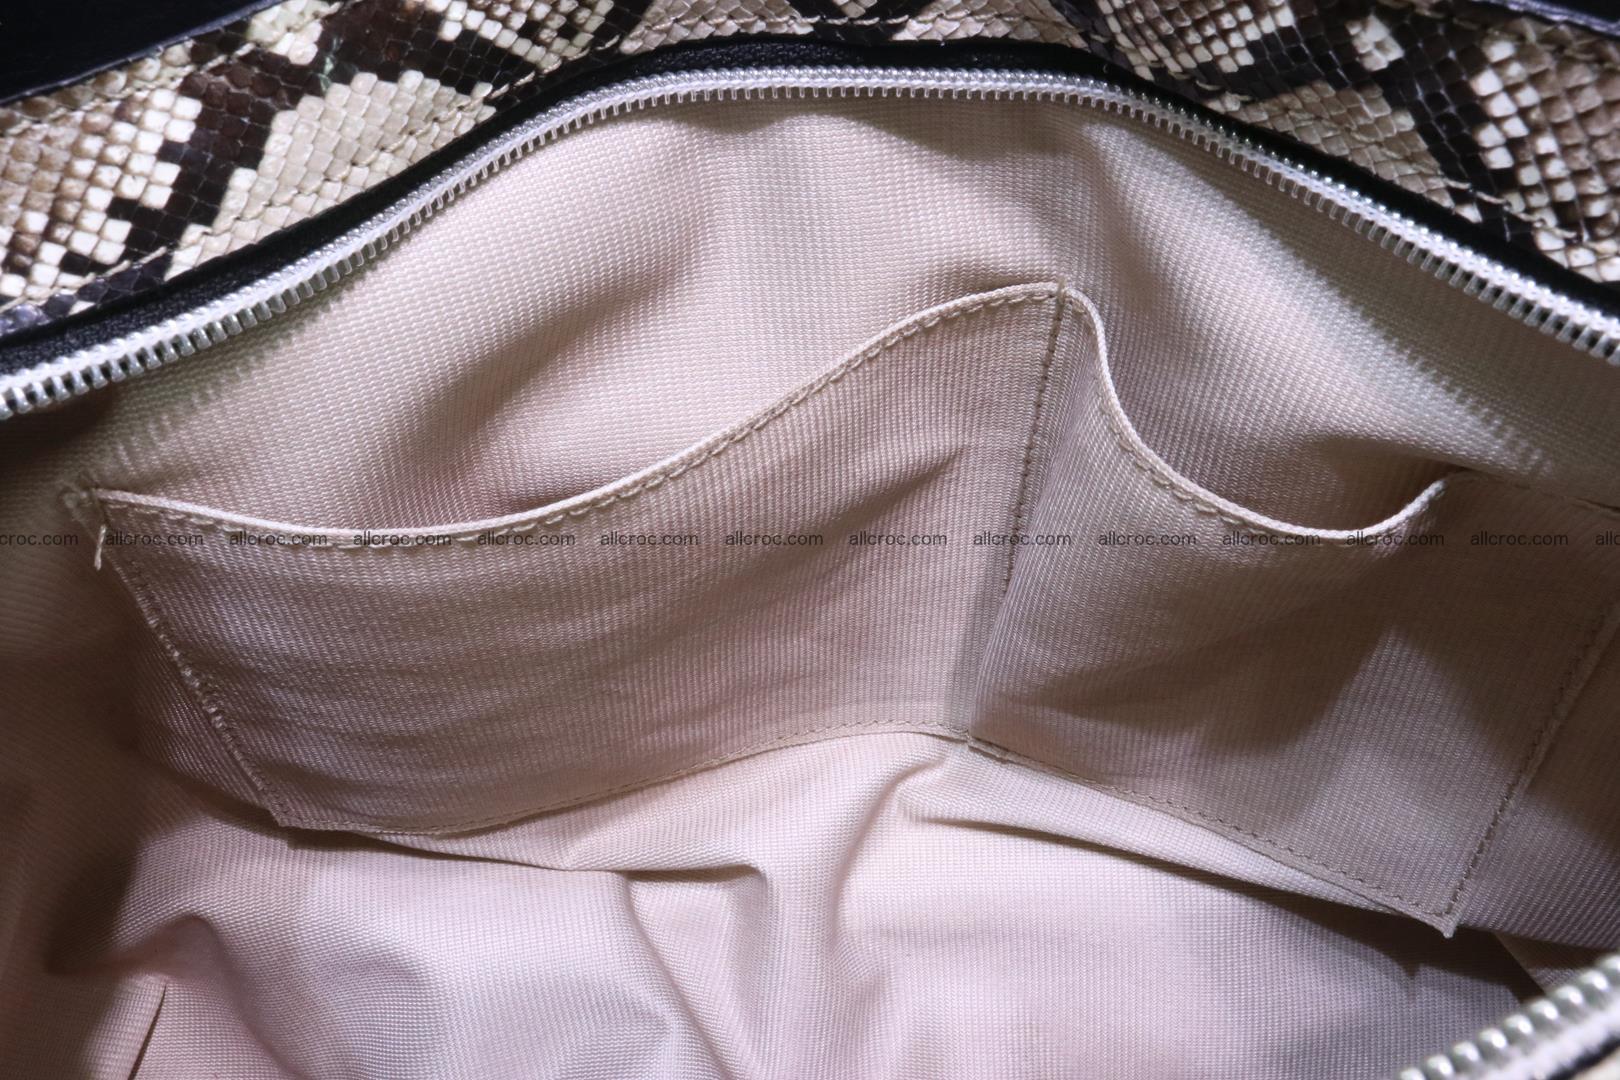 Python skin handbag for lady from genuine Python skin 197 Foto 11